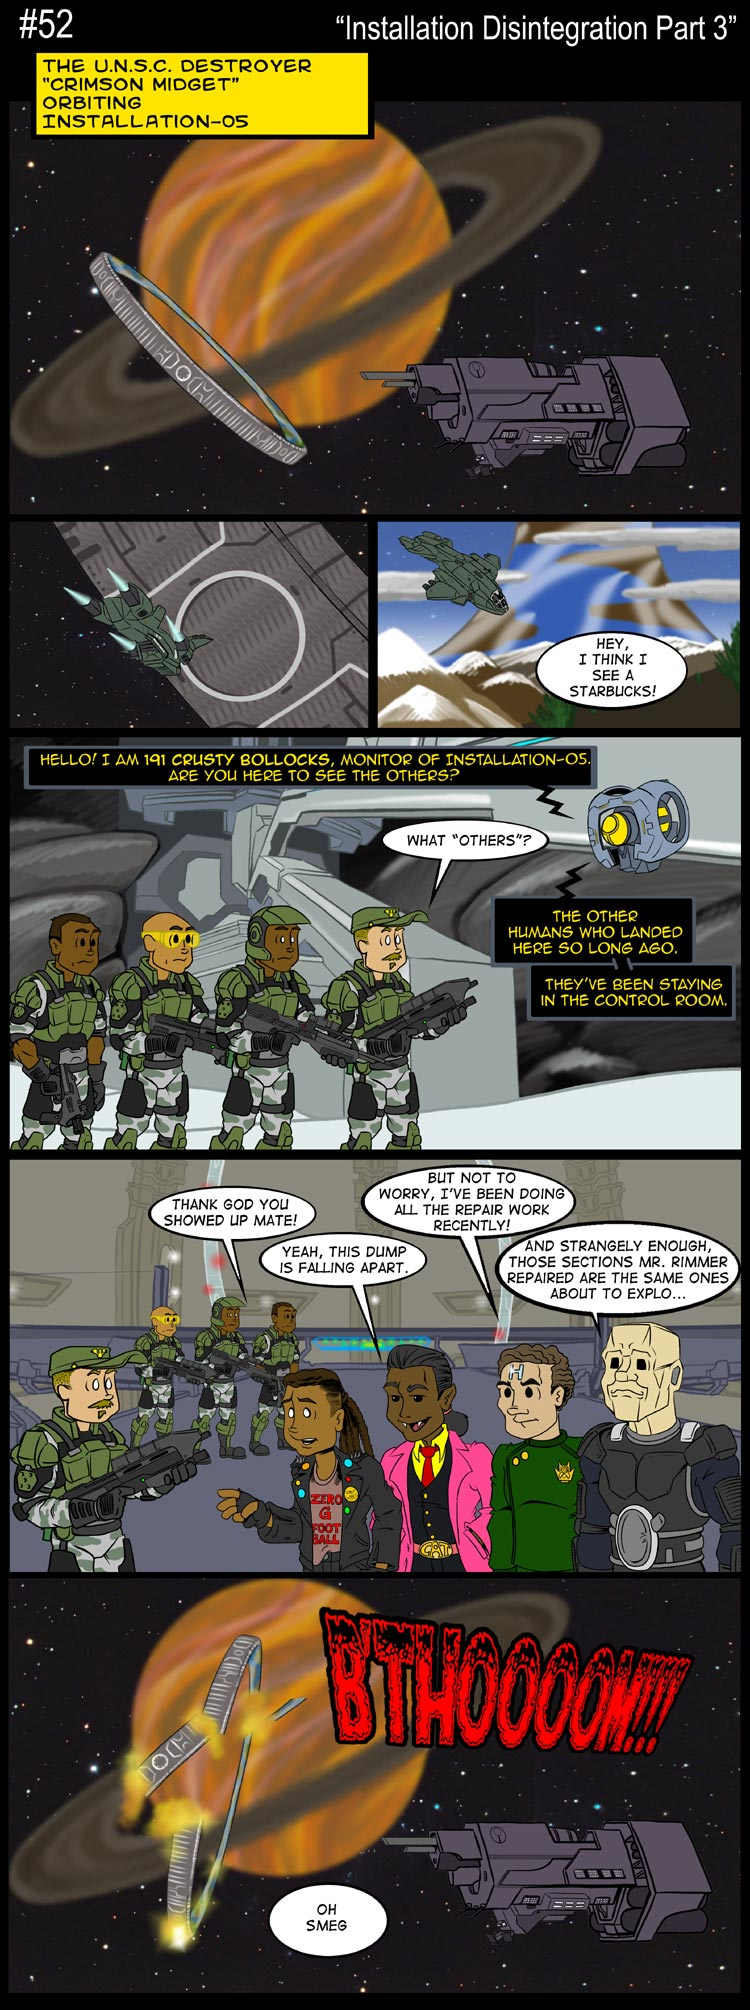 Halo porn comics bad wasn't